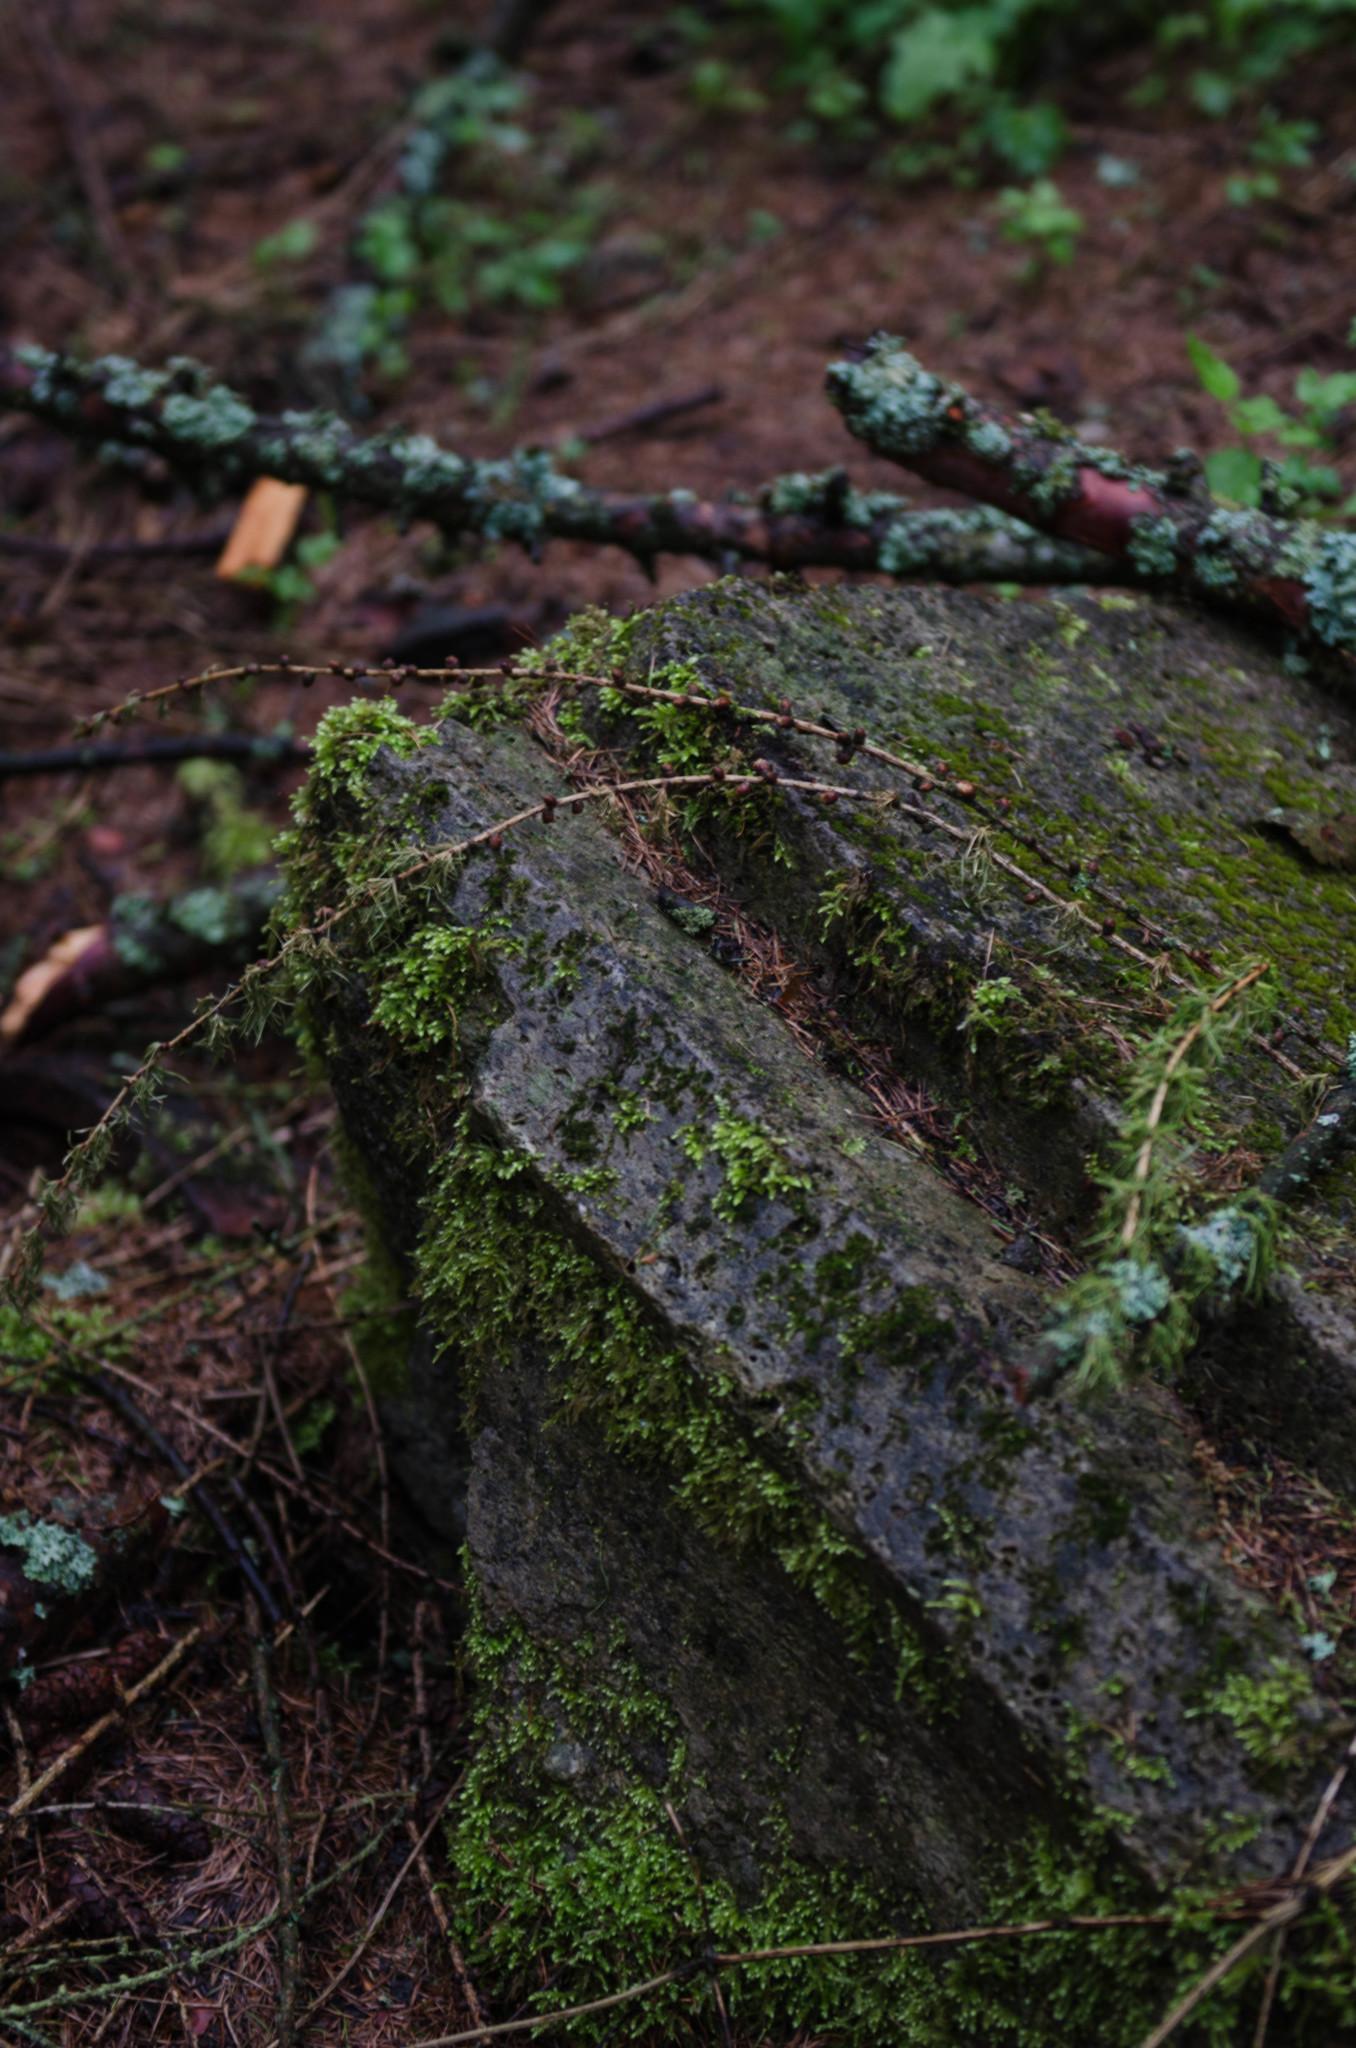 Carinhall gilt als verstecktes Highlight in Brandenburg